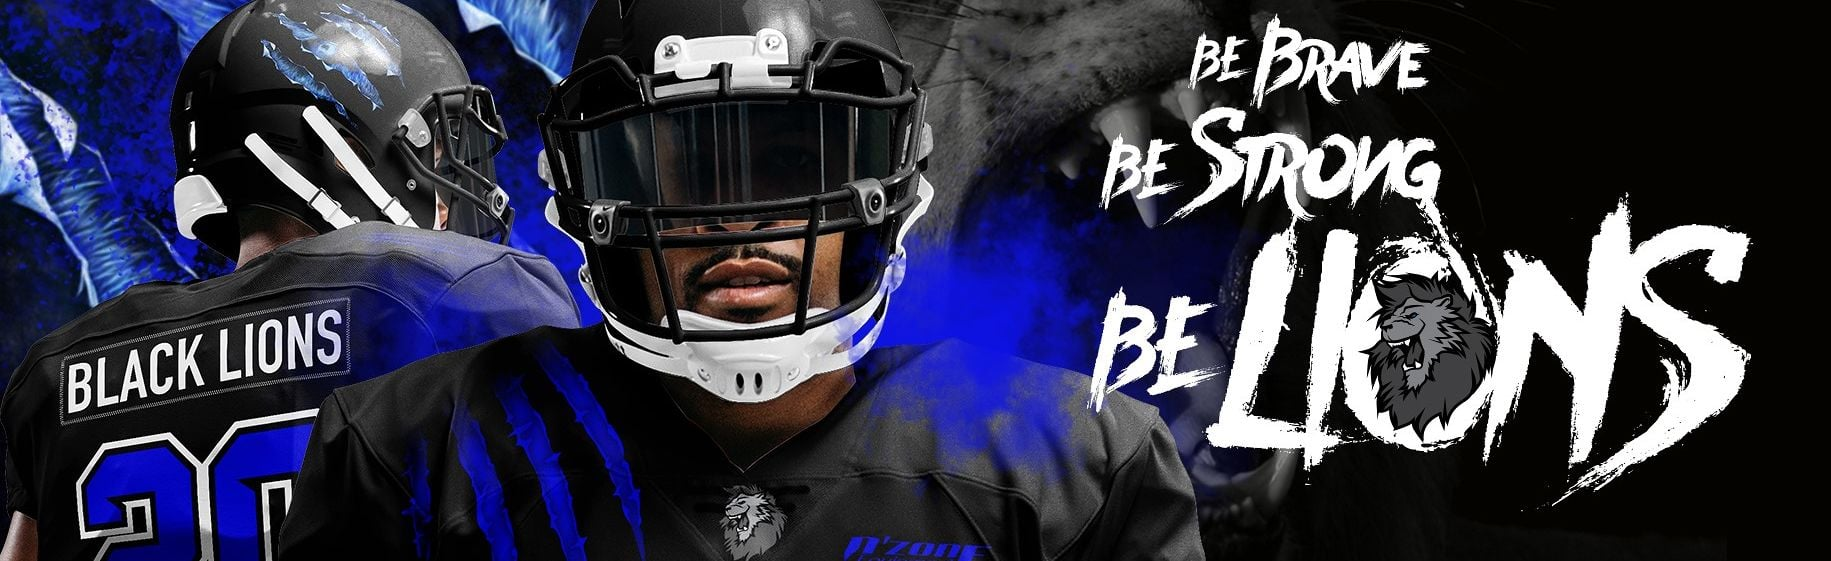 Black Lions Football Americain